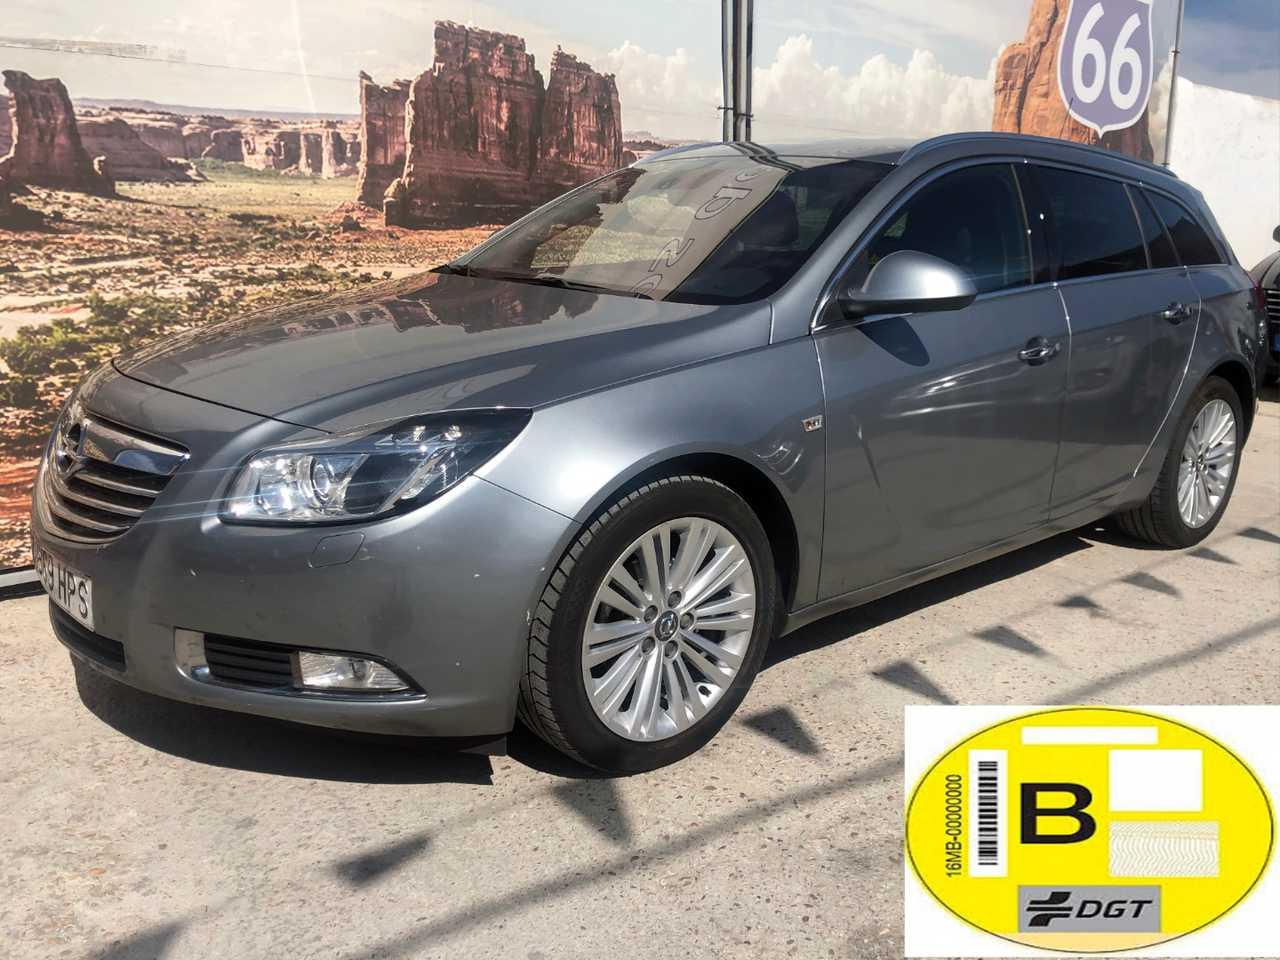 Opel Insignia Sports Tourer 2.0 CDTI SS 130 CV Selective   - Foto 1